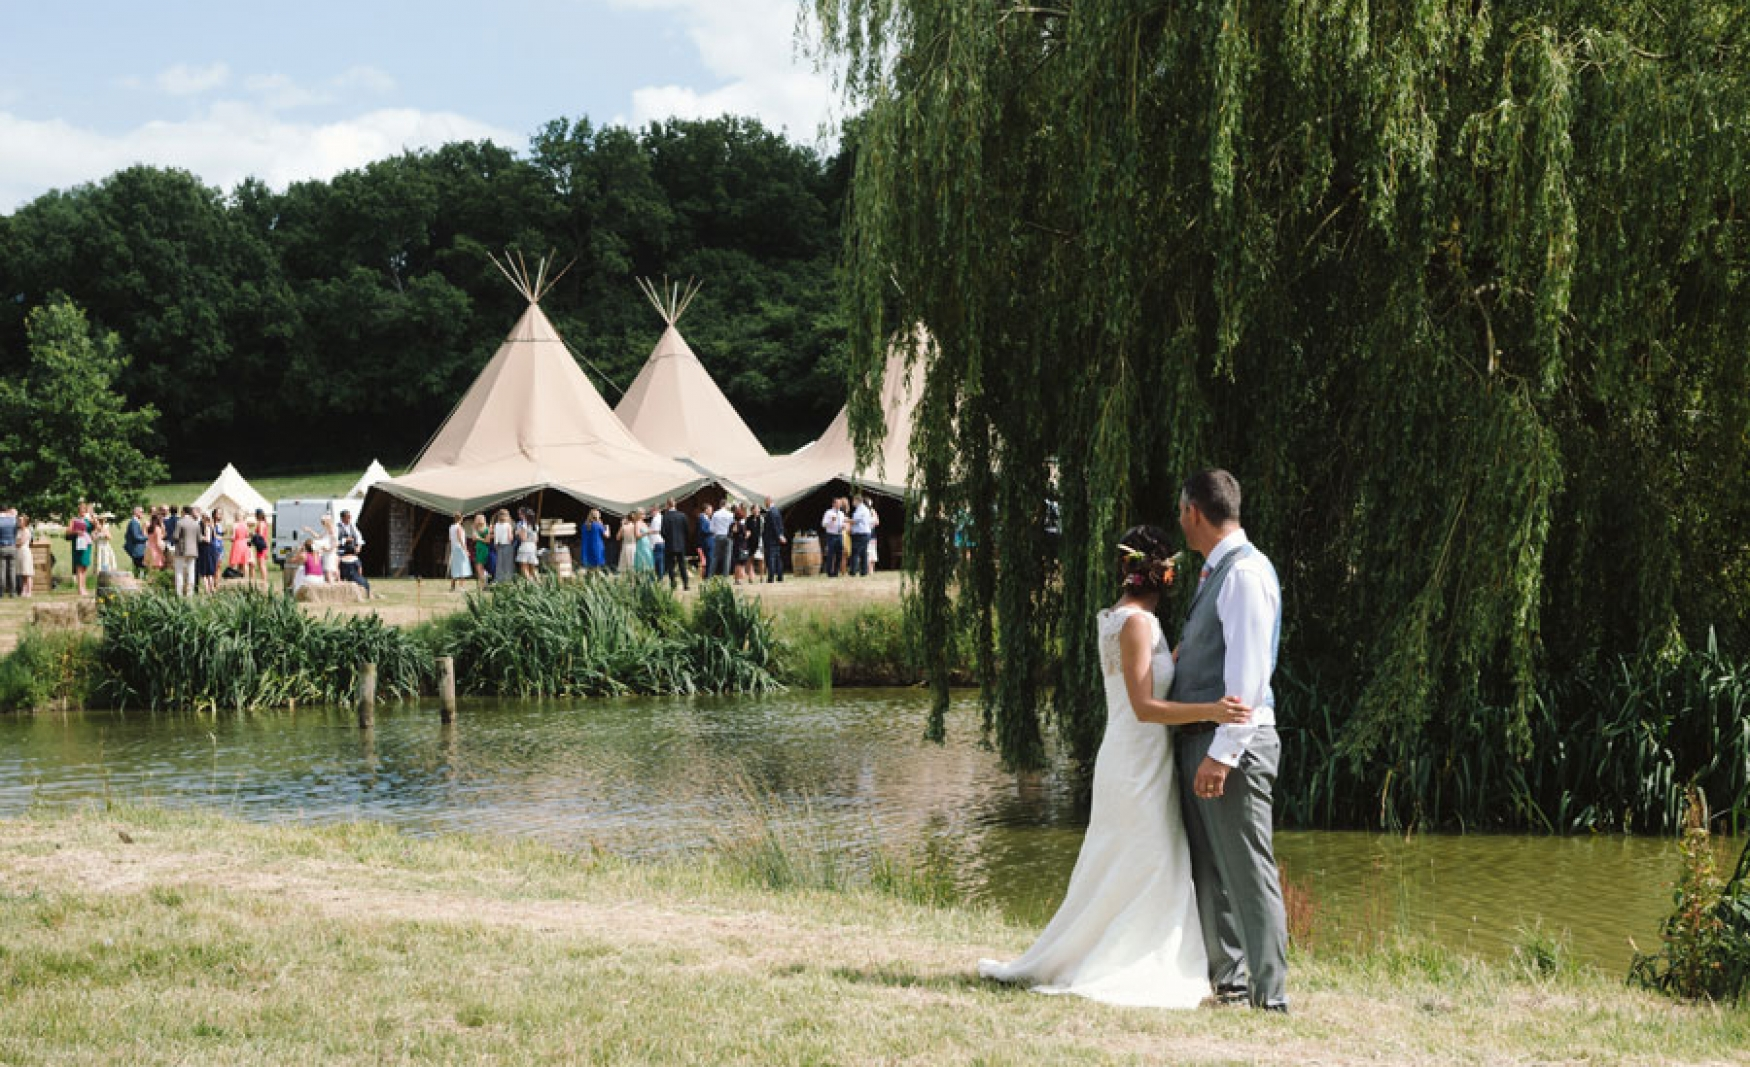 fiesta-fields-outdoor-wedding-events-company-tipi-surrey-sussex-maplehurst-farm-nuthurst-2